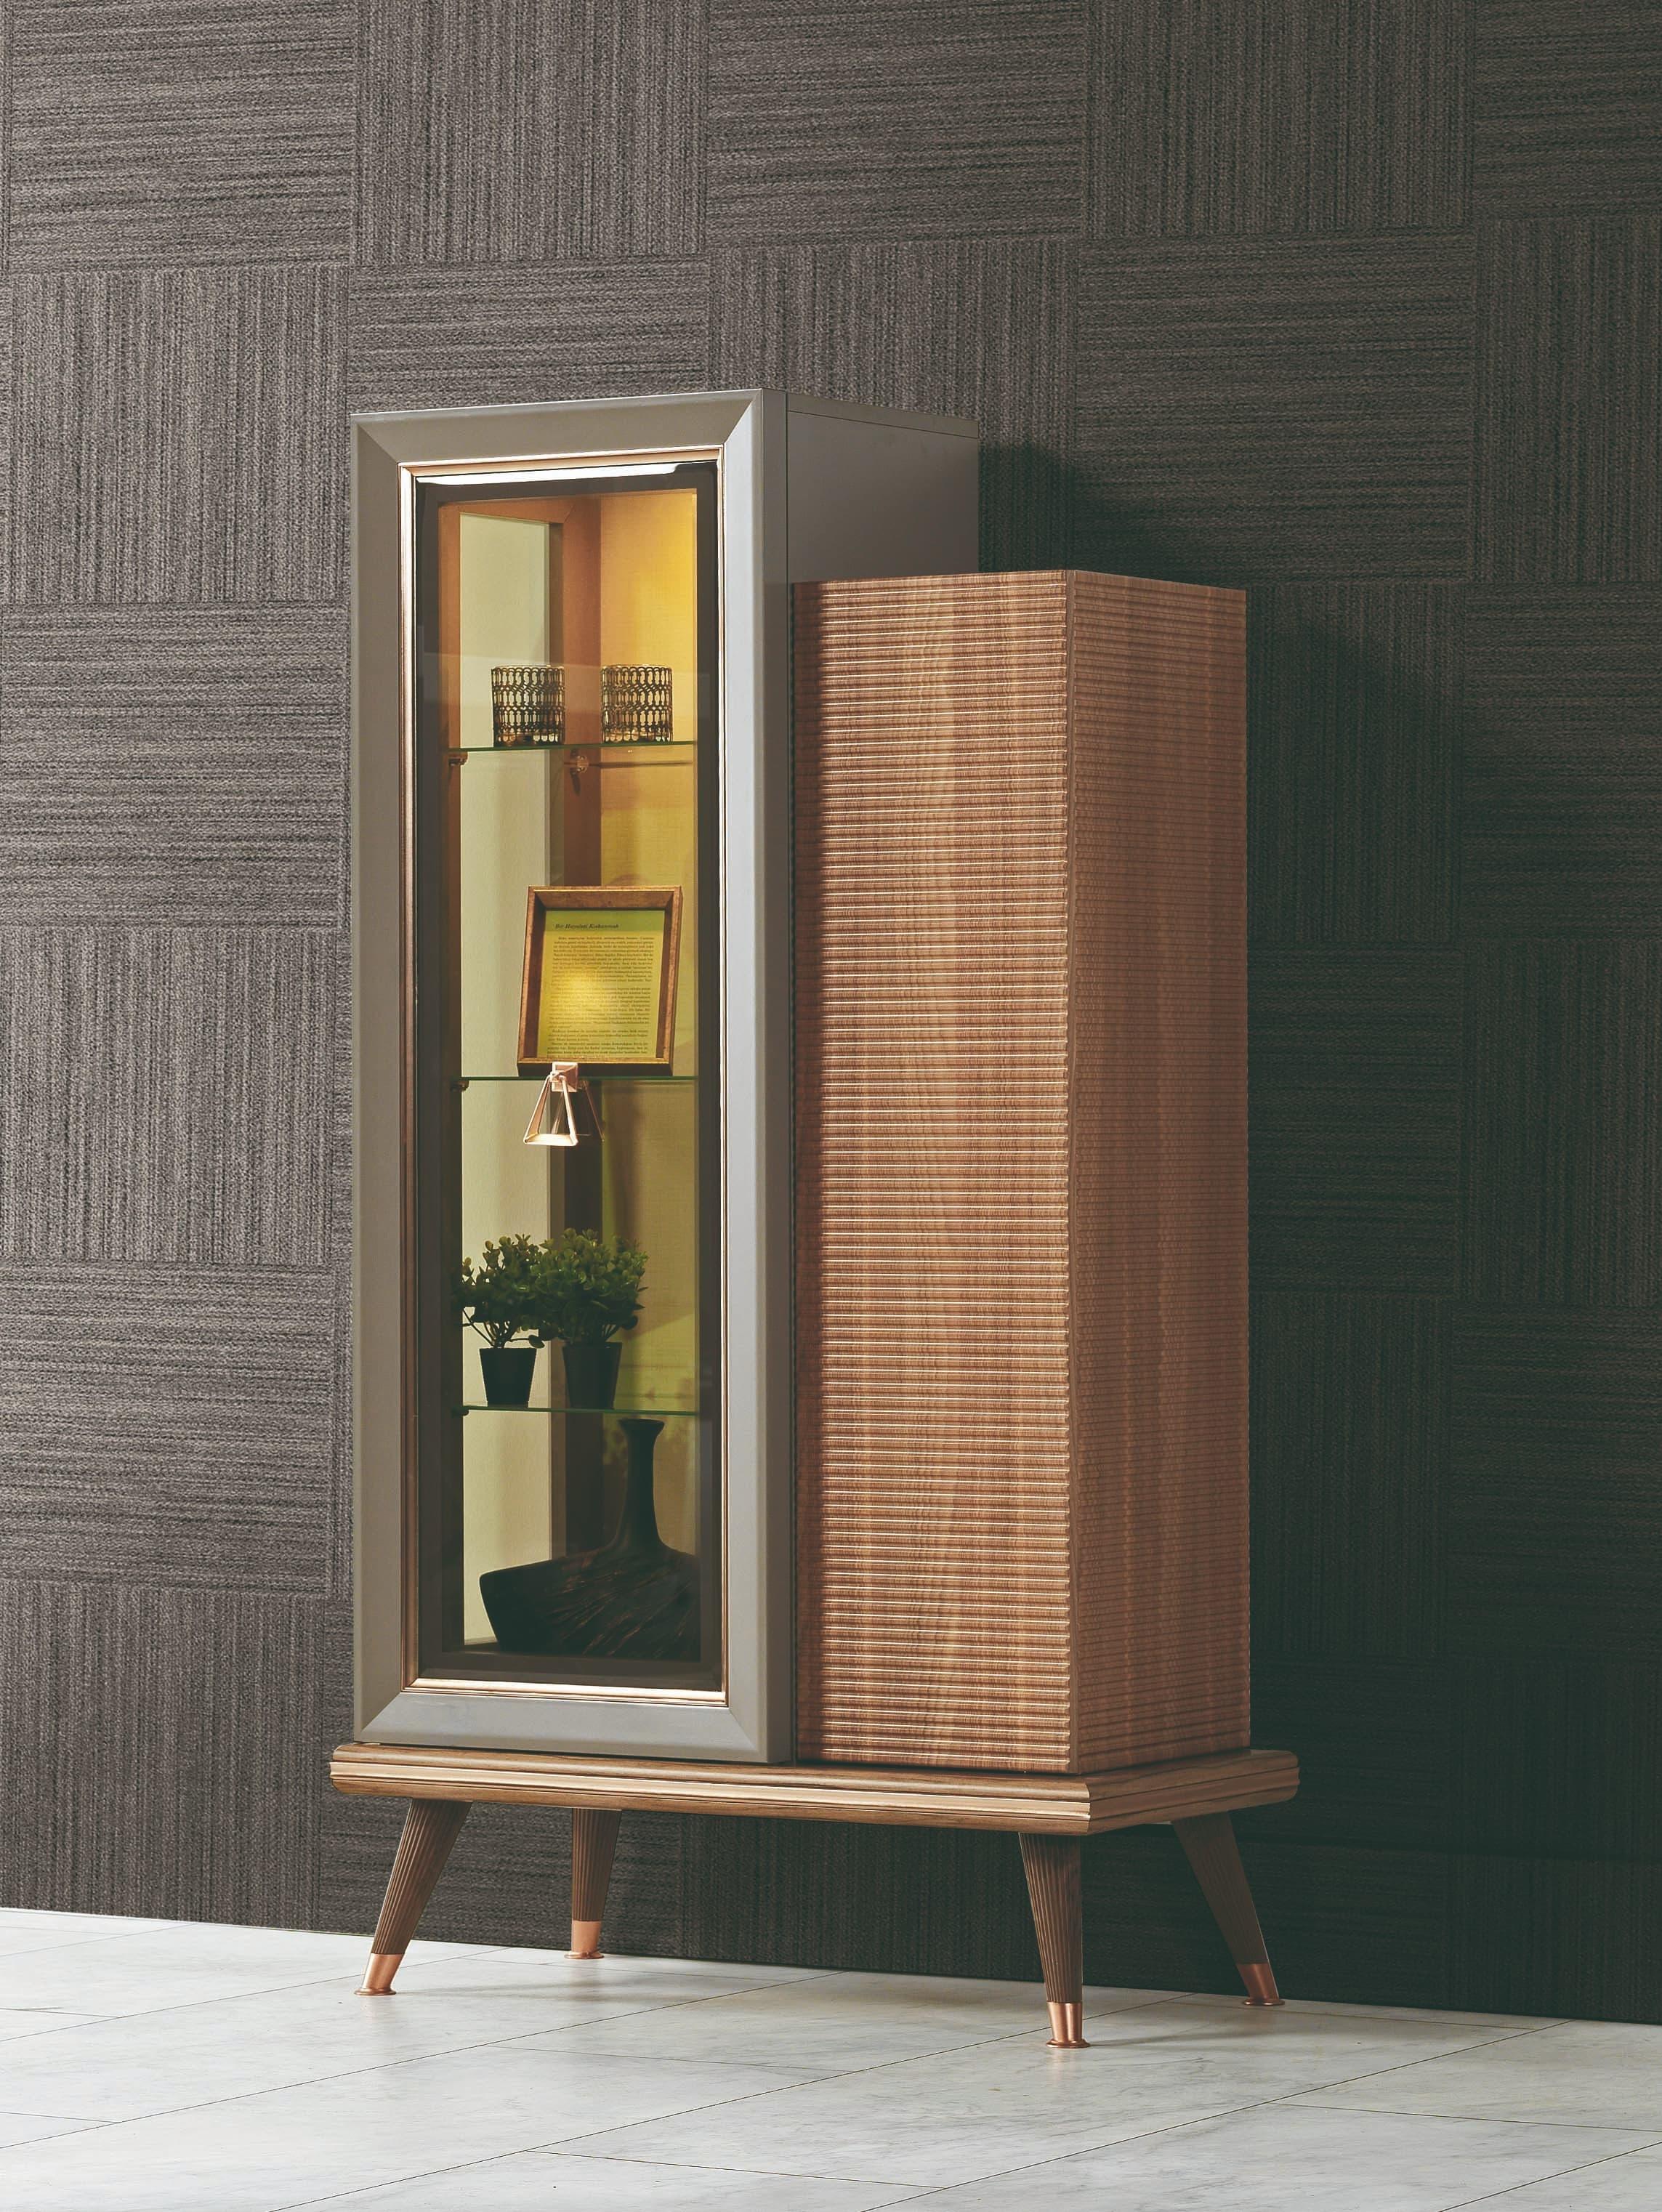 Vitrina din pal cu 2 usi Toscana Dore Gri / Natural, l85xA43xH157 cm somproduct.ro